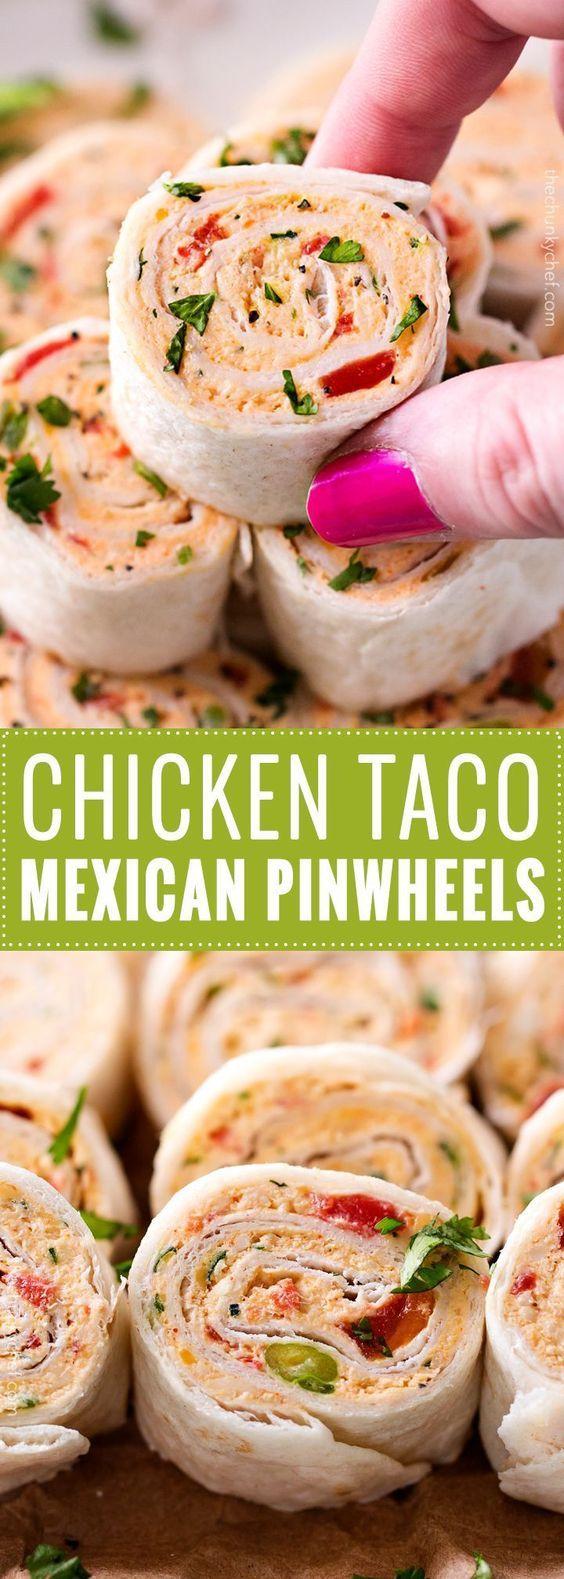 CHICKEN TACO MEXICAN PINWHEELS #appetizer #chicken #taco #mexican #pinwheels